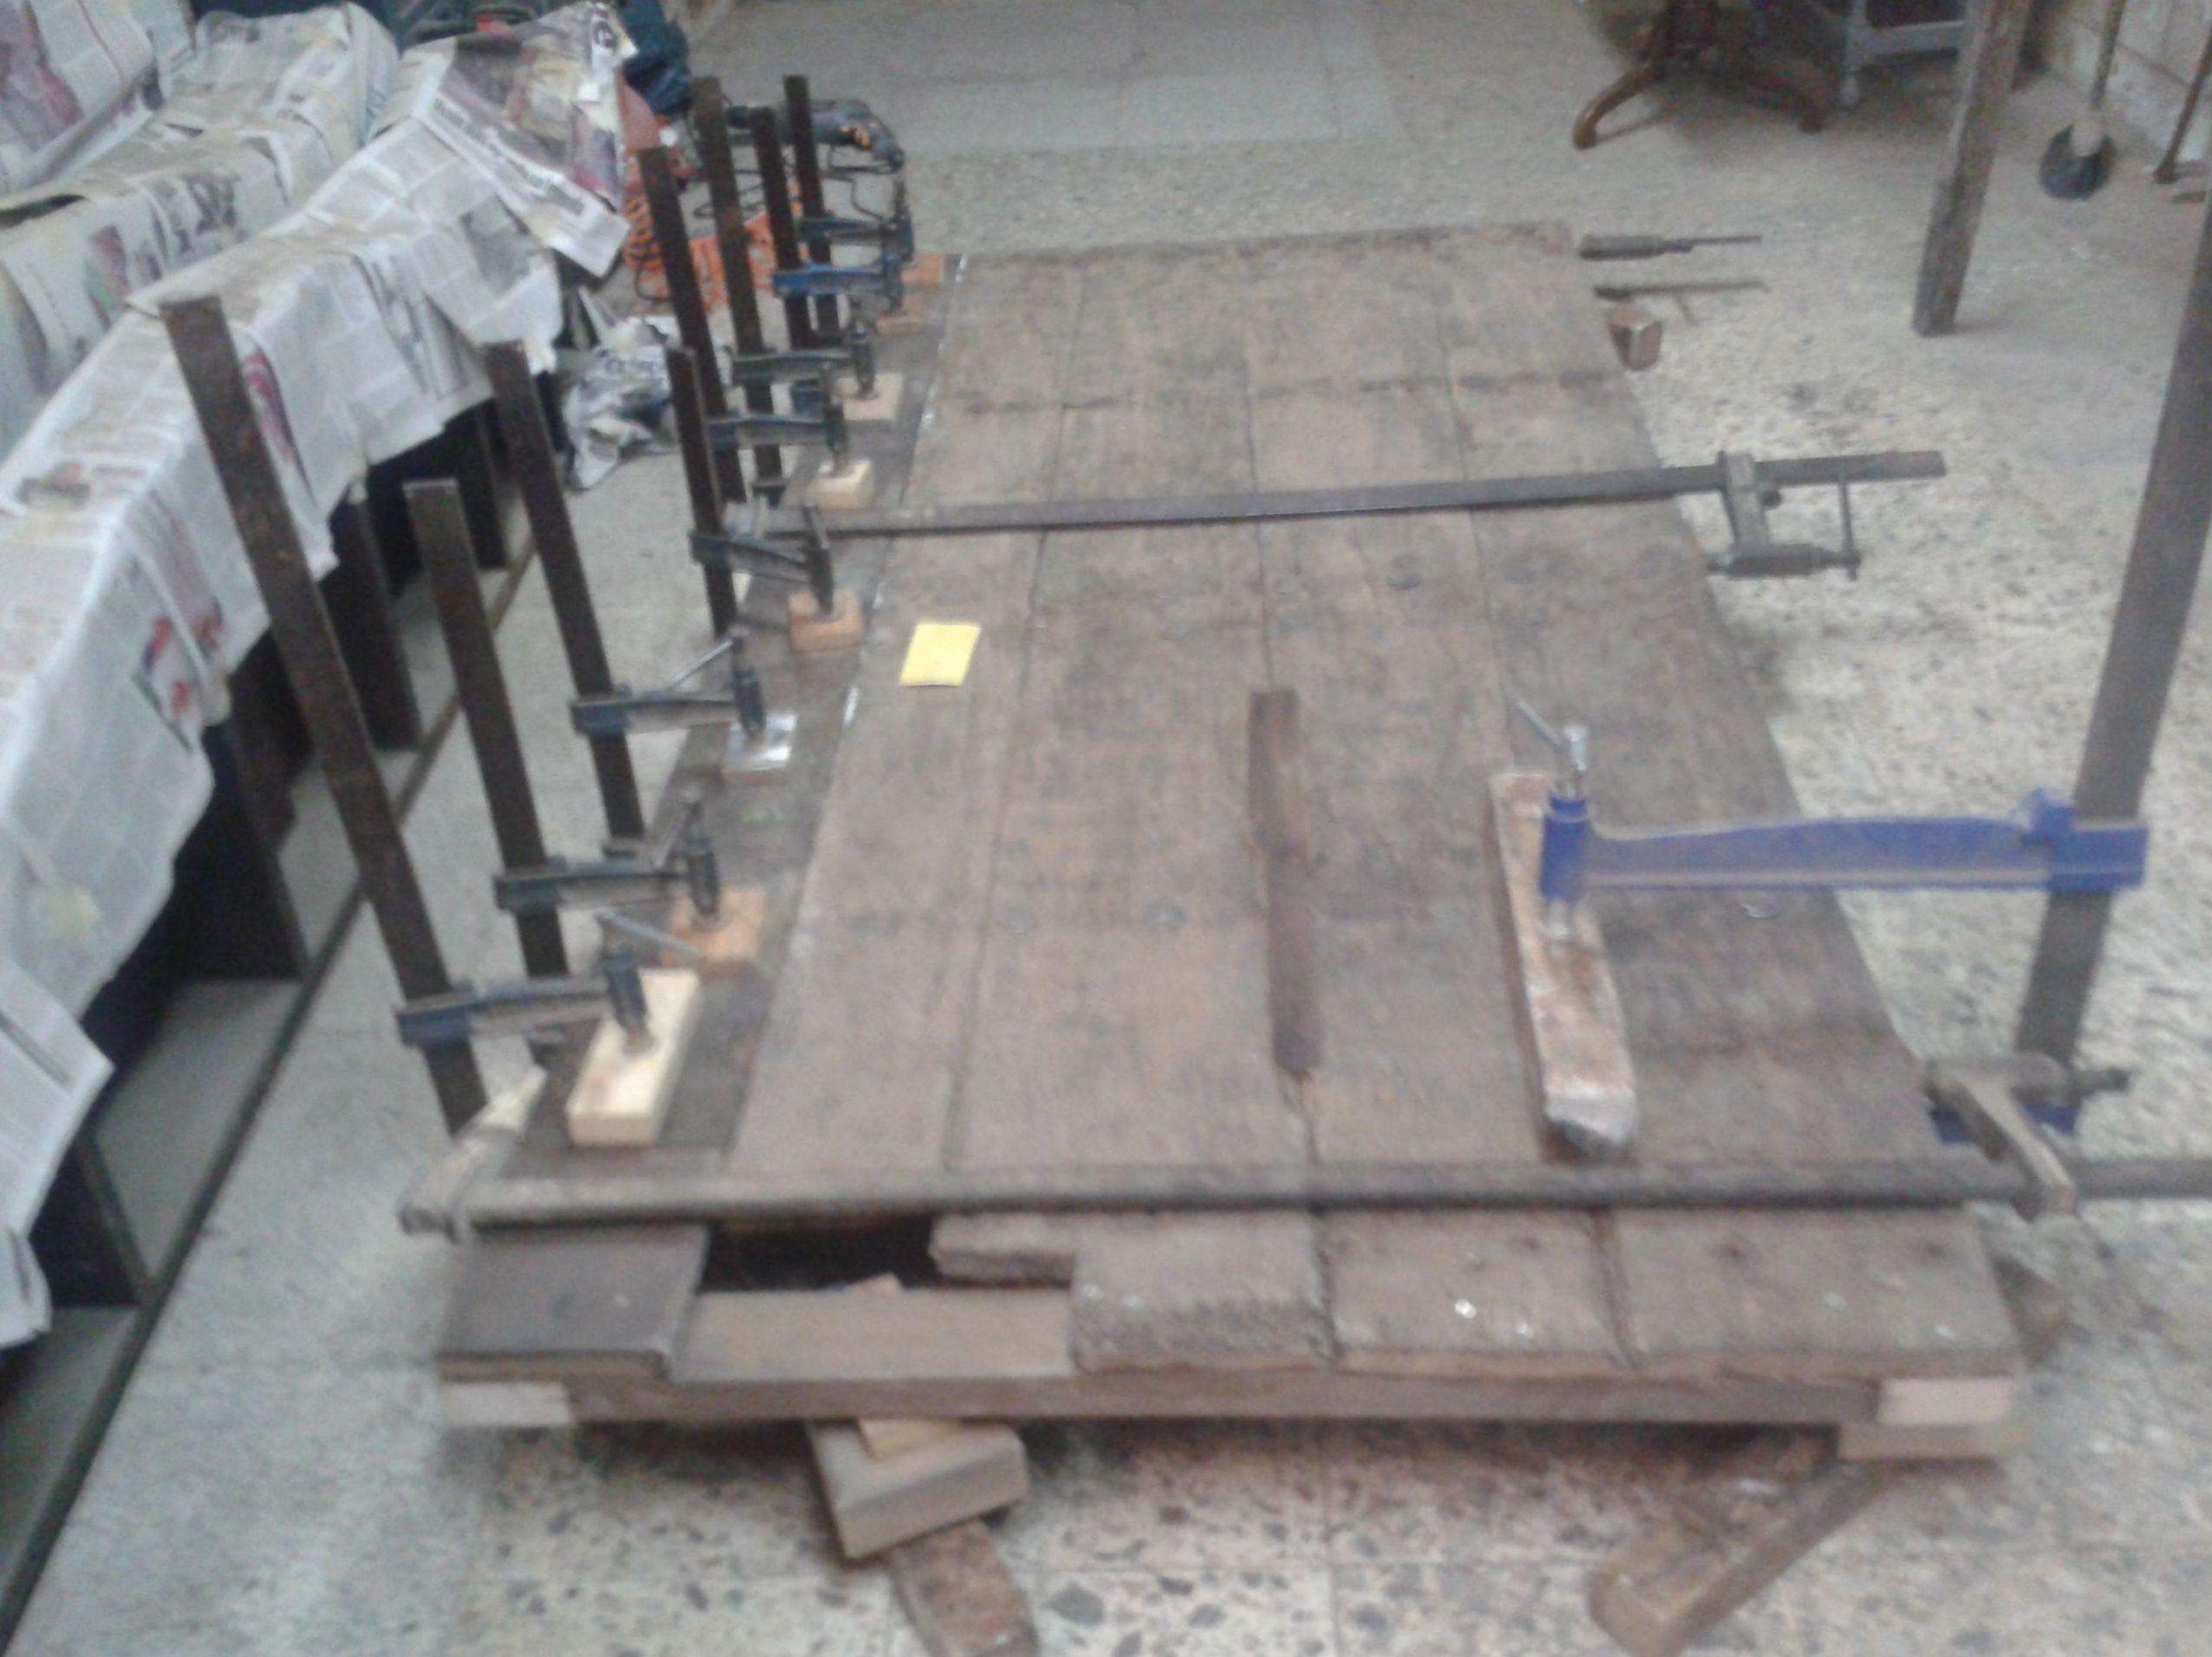 Foto 64 de Restauración de muebles en Pamplona | Lendik Restauración